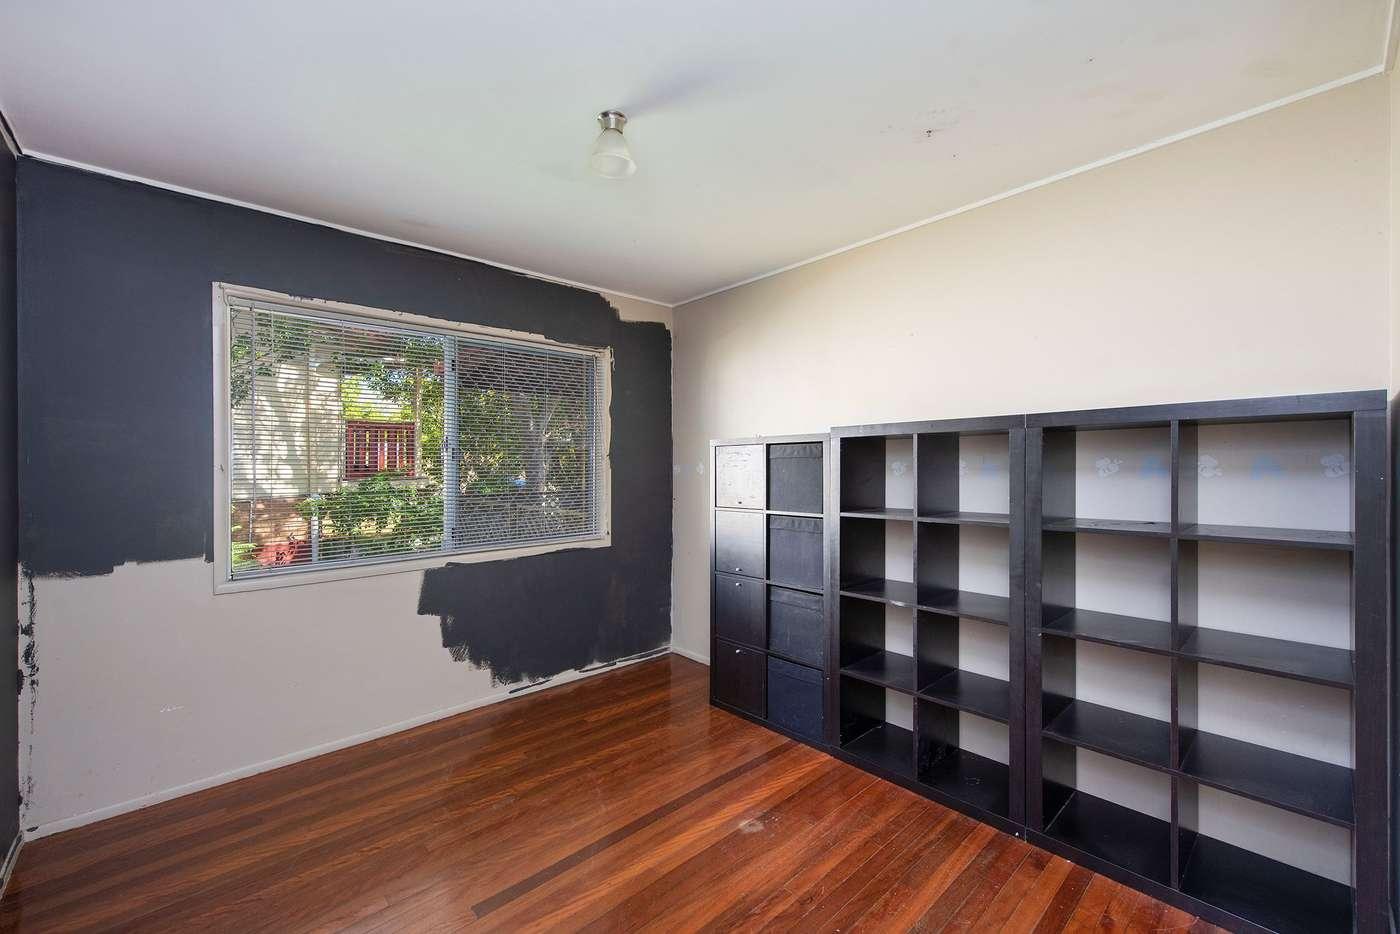 Seventh view of Homely house listing, 3 Balmoral Street, Slacks Creek QLD 4127